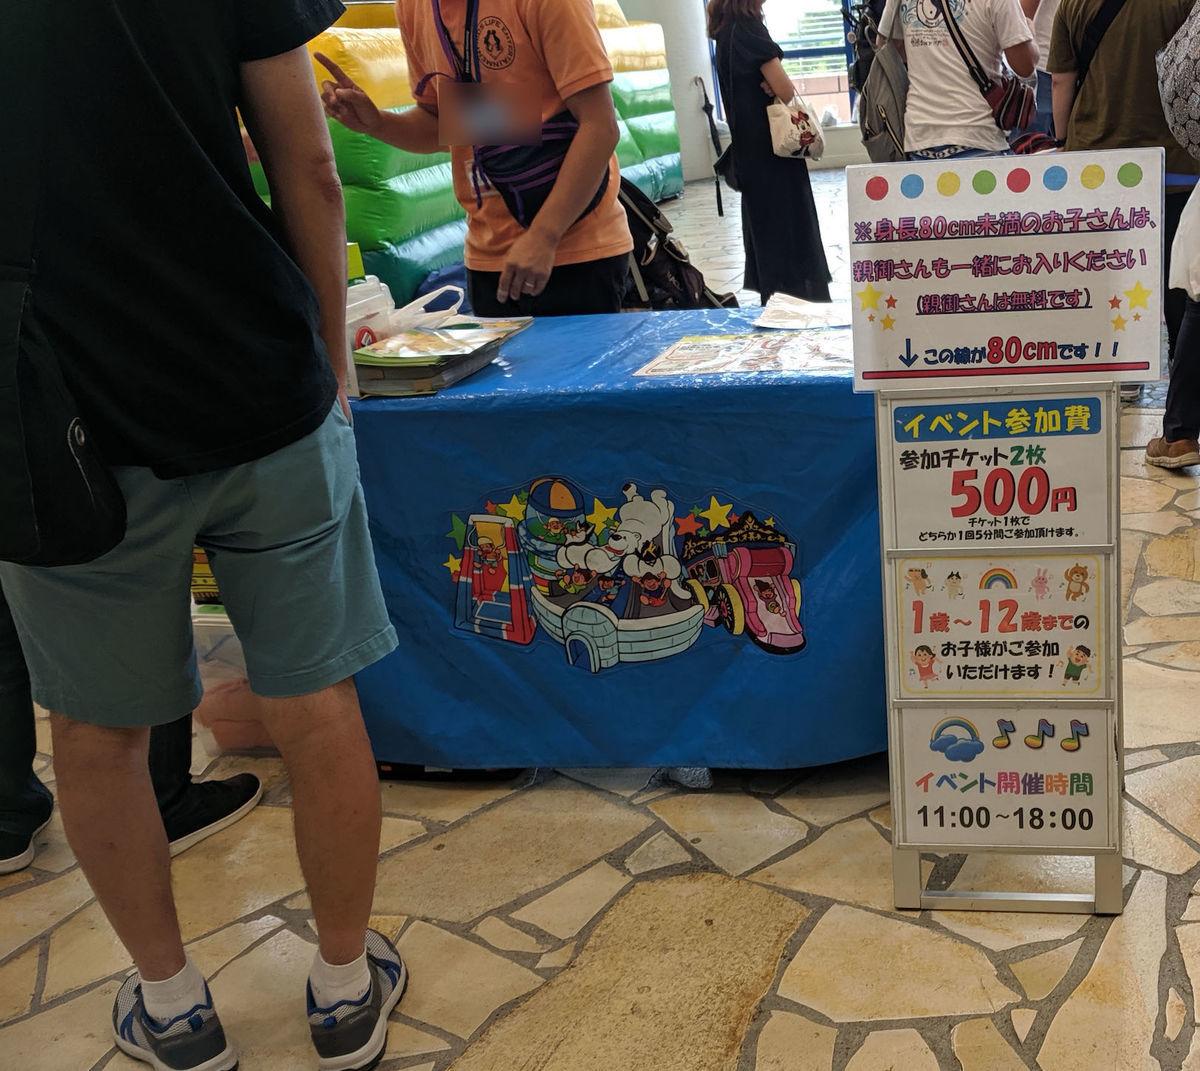 Price of air slider and room at Aqua City Odaiba